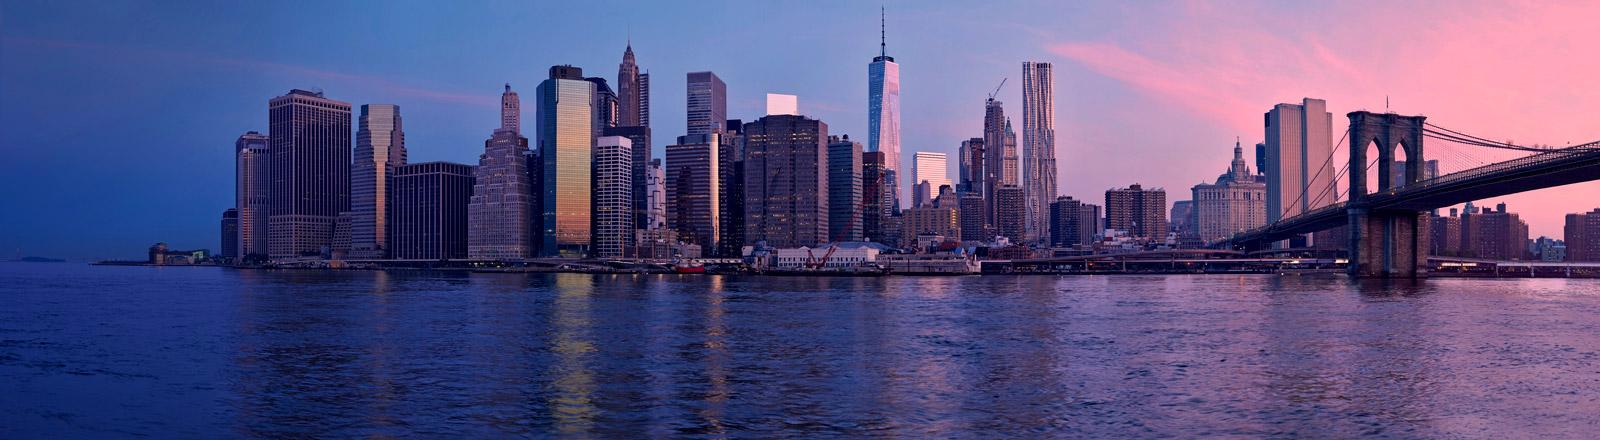 Skyline New Yorks